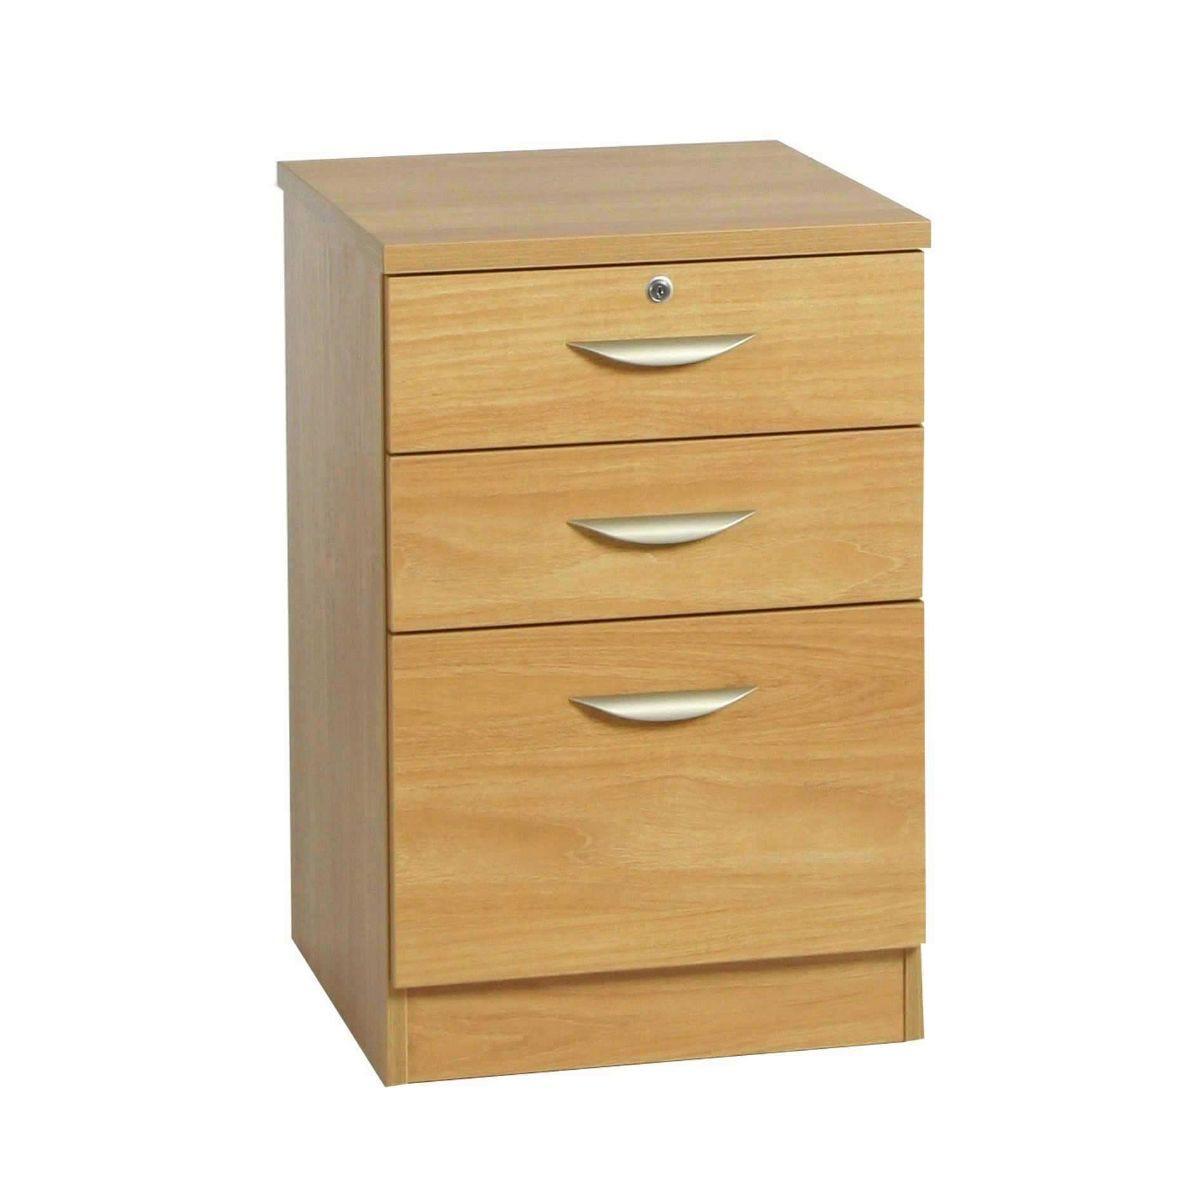 R White Combination Cabinet 3 Drawer B-3CU H728xW479xD540mm, Classic Oak